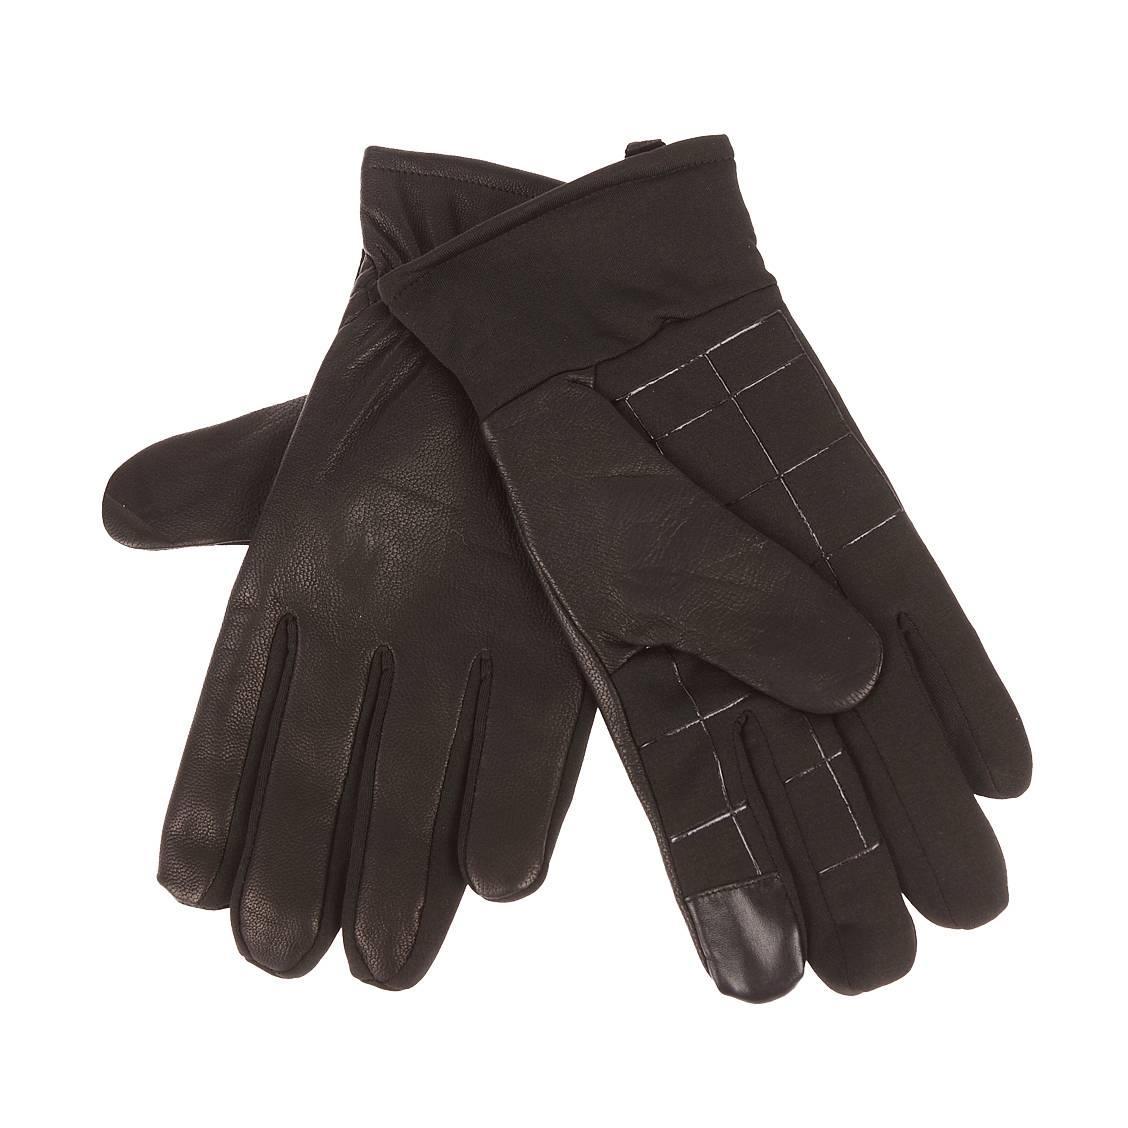 Gants <strong>dockers</strong> en cuir noir spécial écran tactile